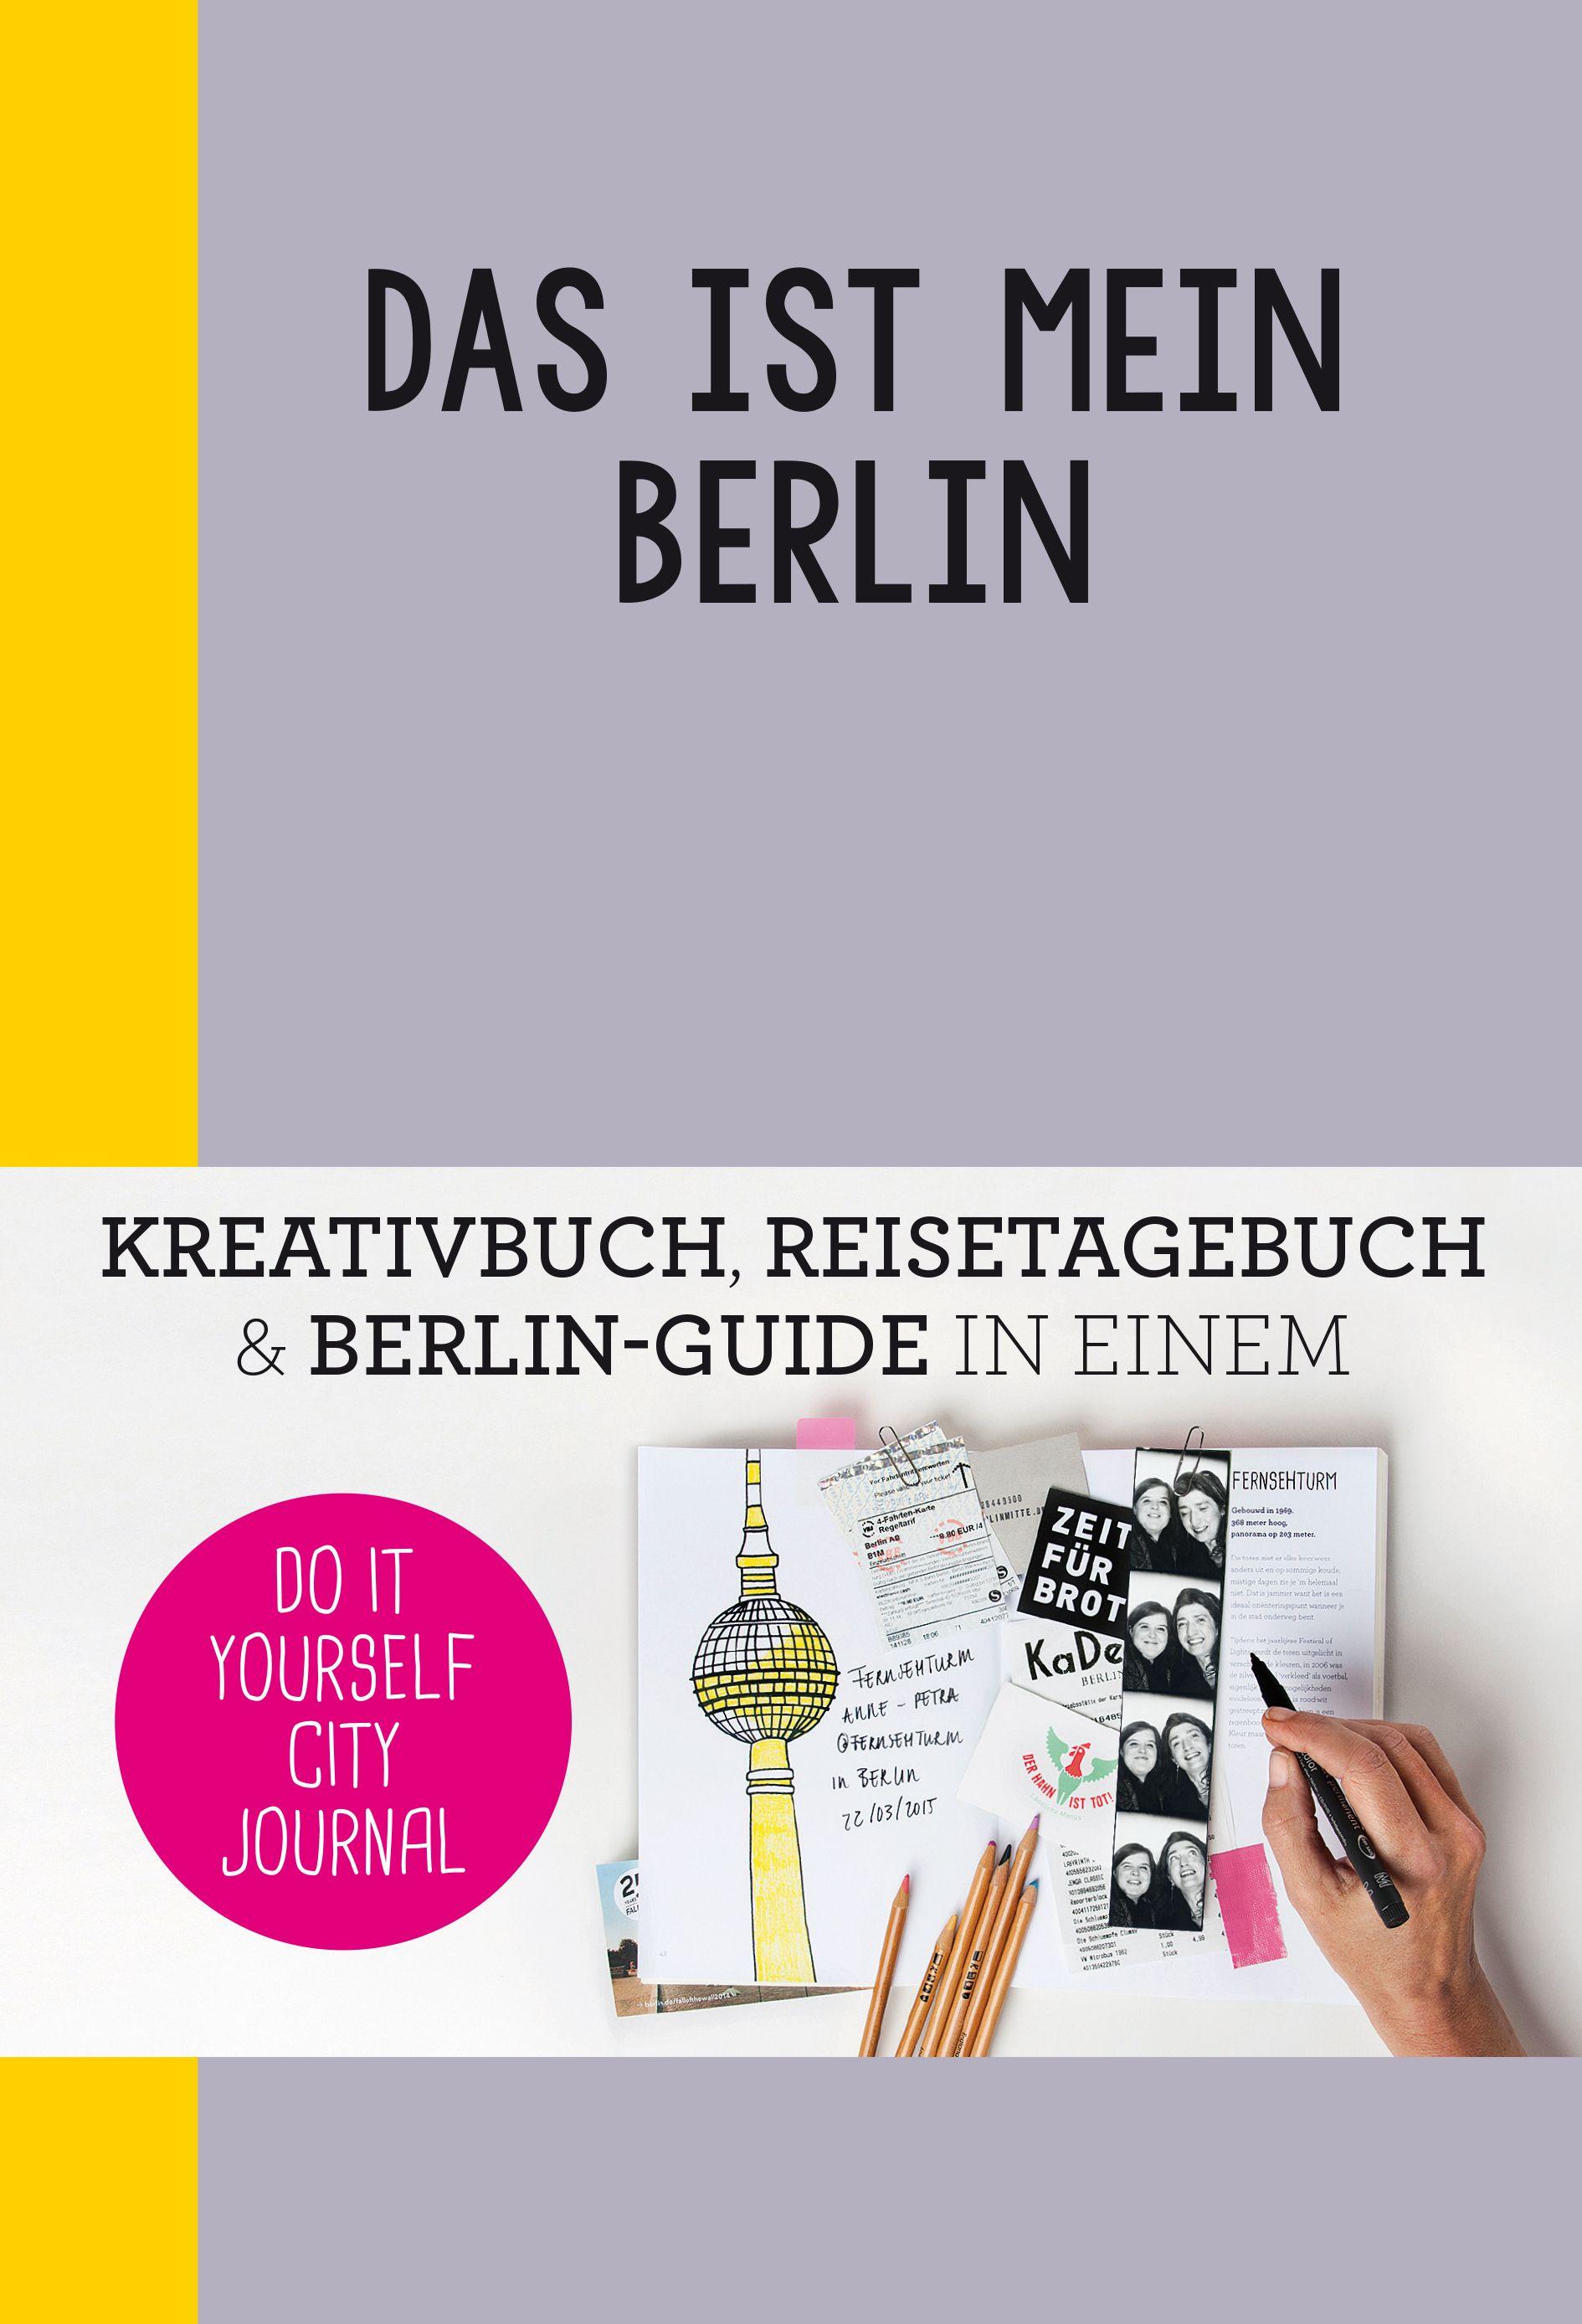 Mit dem do it yourself city journal berlin kann jeder kreativ werden mit dem do it yourself city journal berlin kann jeder kreativ werden die stadt erkunden solutioingenieria Choice Image